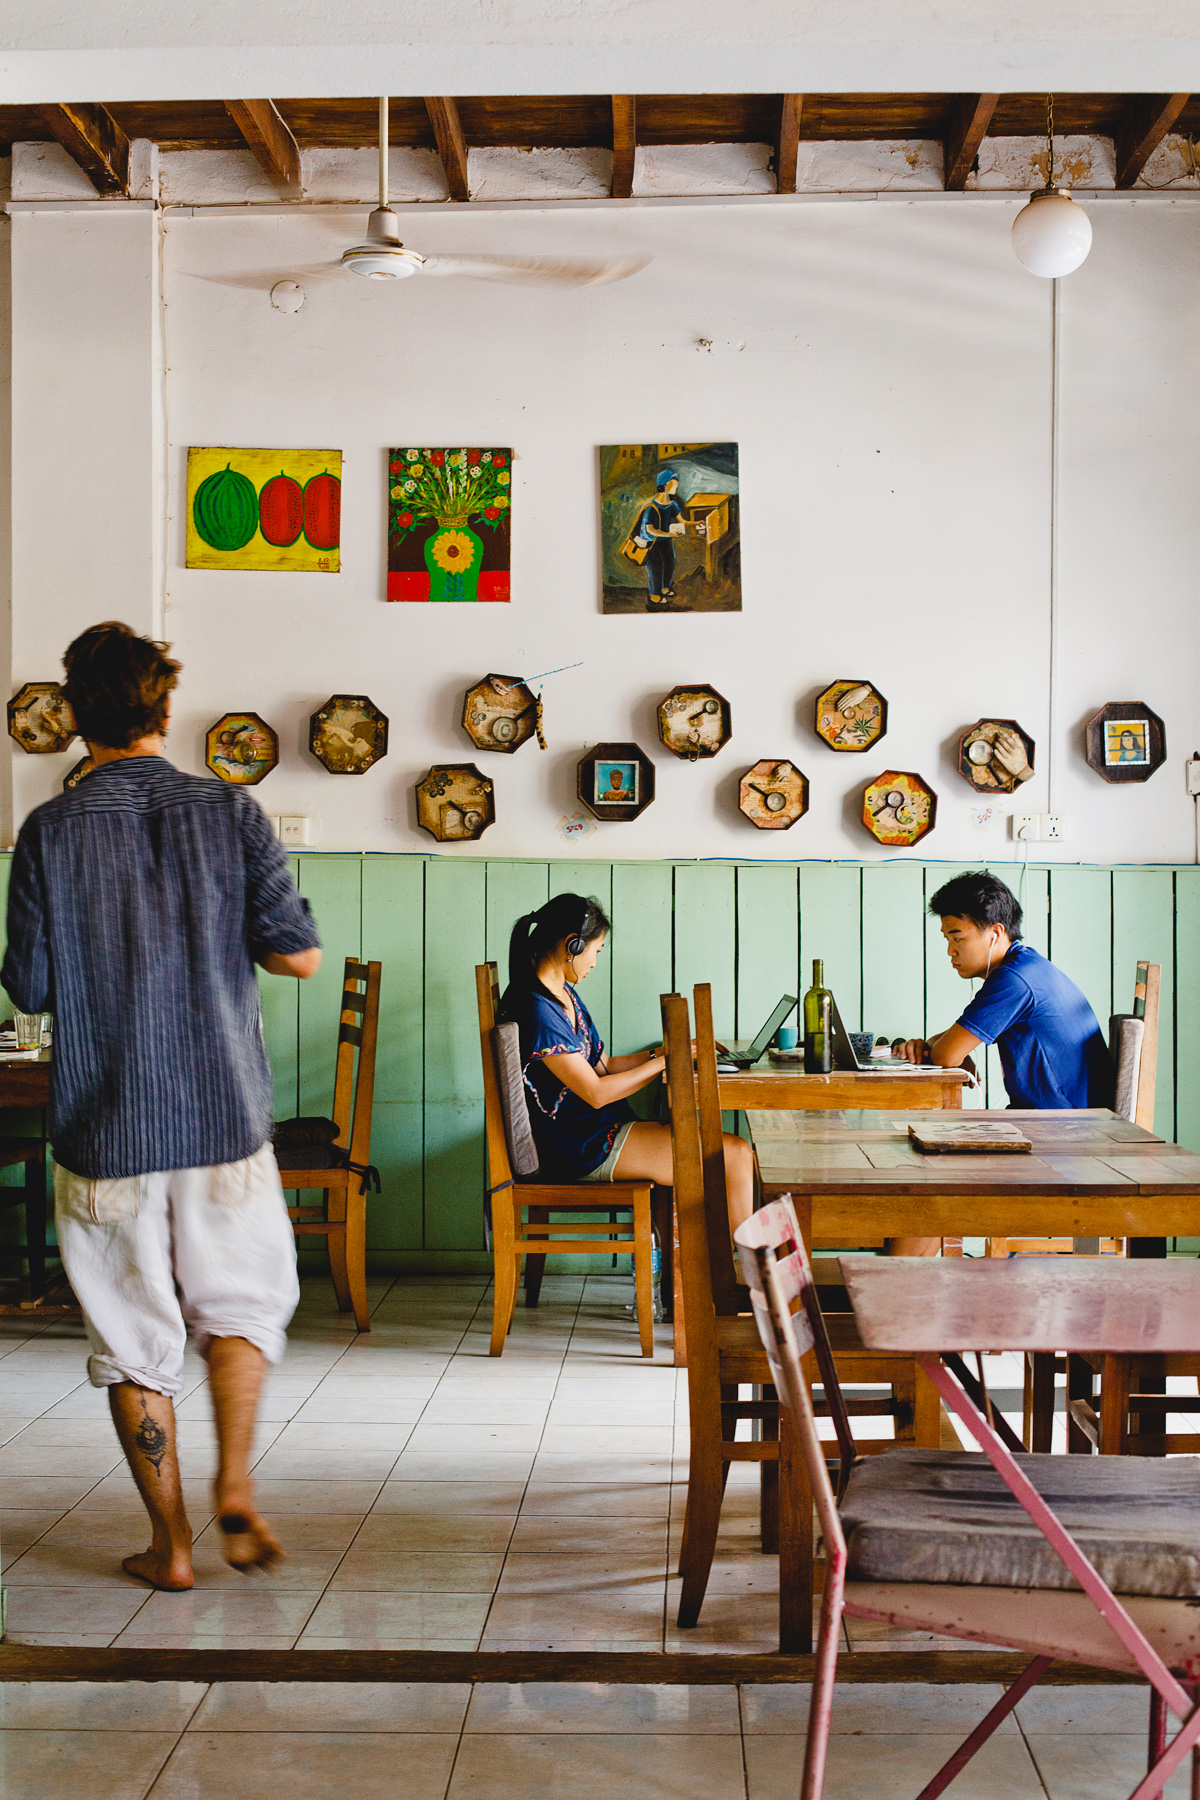 The interior at Ellie's café.